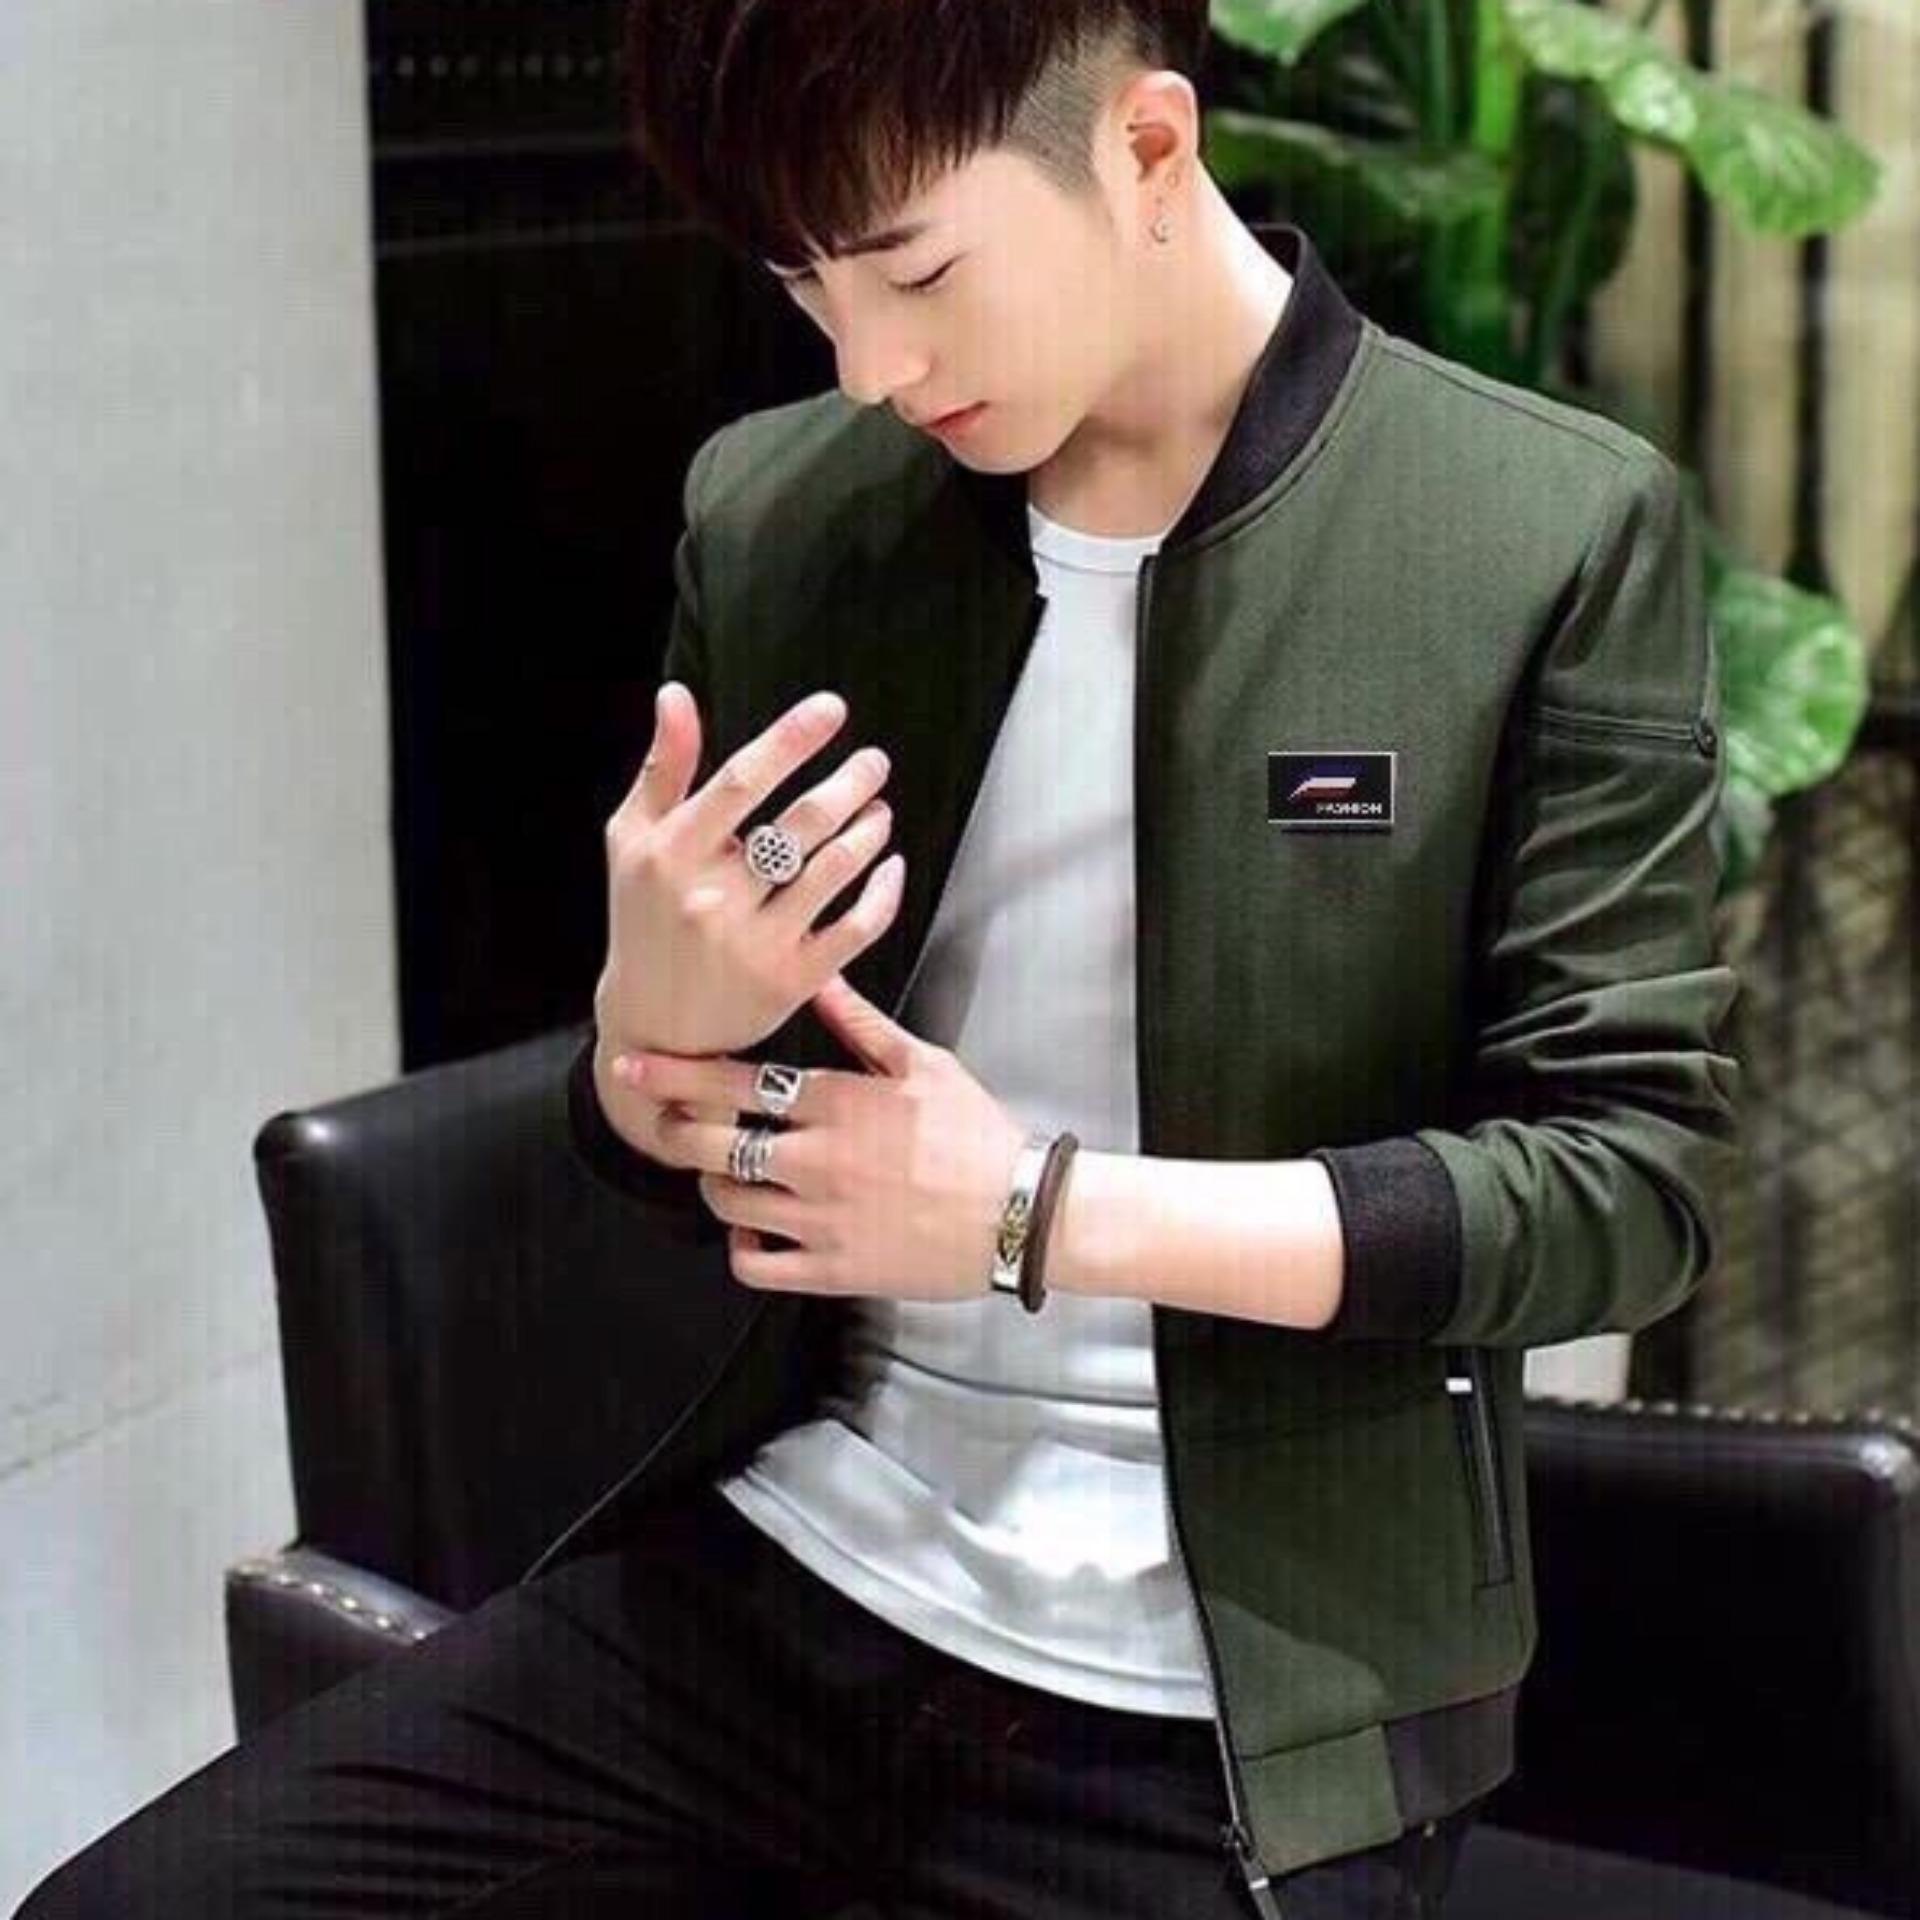 Áo Khoác Nam Kaki Cao Cấp H.h.p Fashion Mtv 70